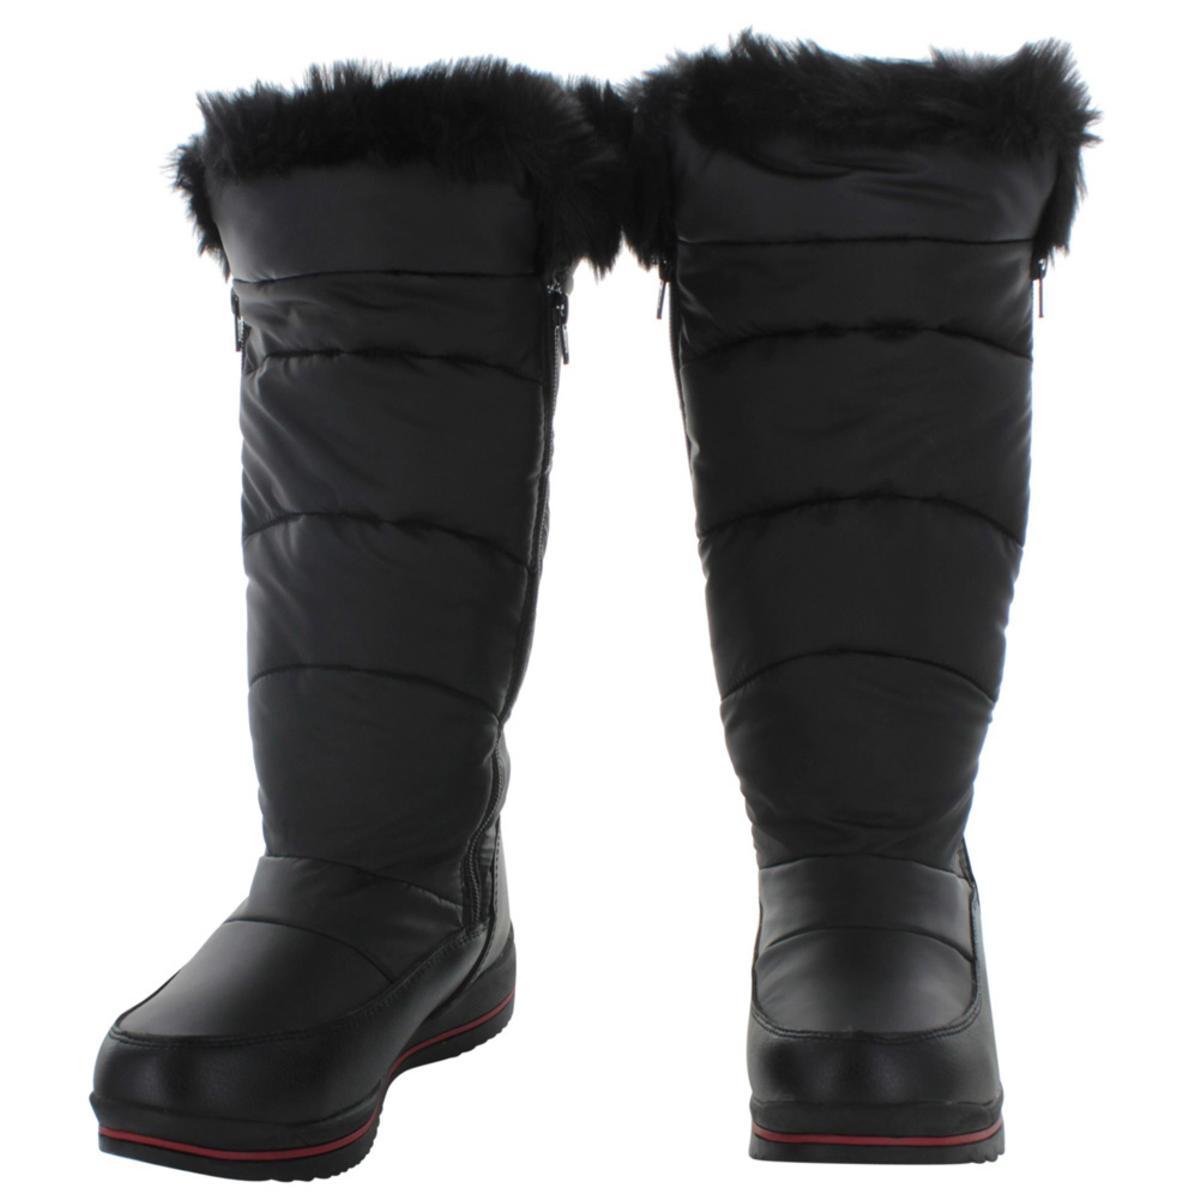 98da7b6a2a6d2 Cougar Bistro Women's Tall Waterproof Nylon Winter Snow Boots | eBay